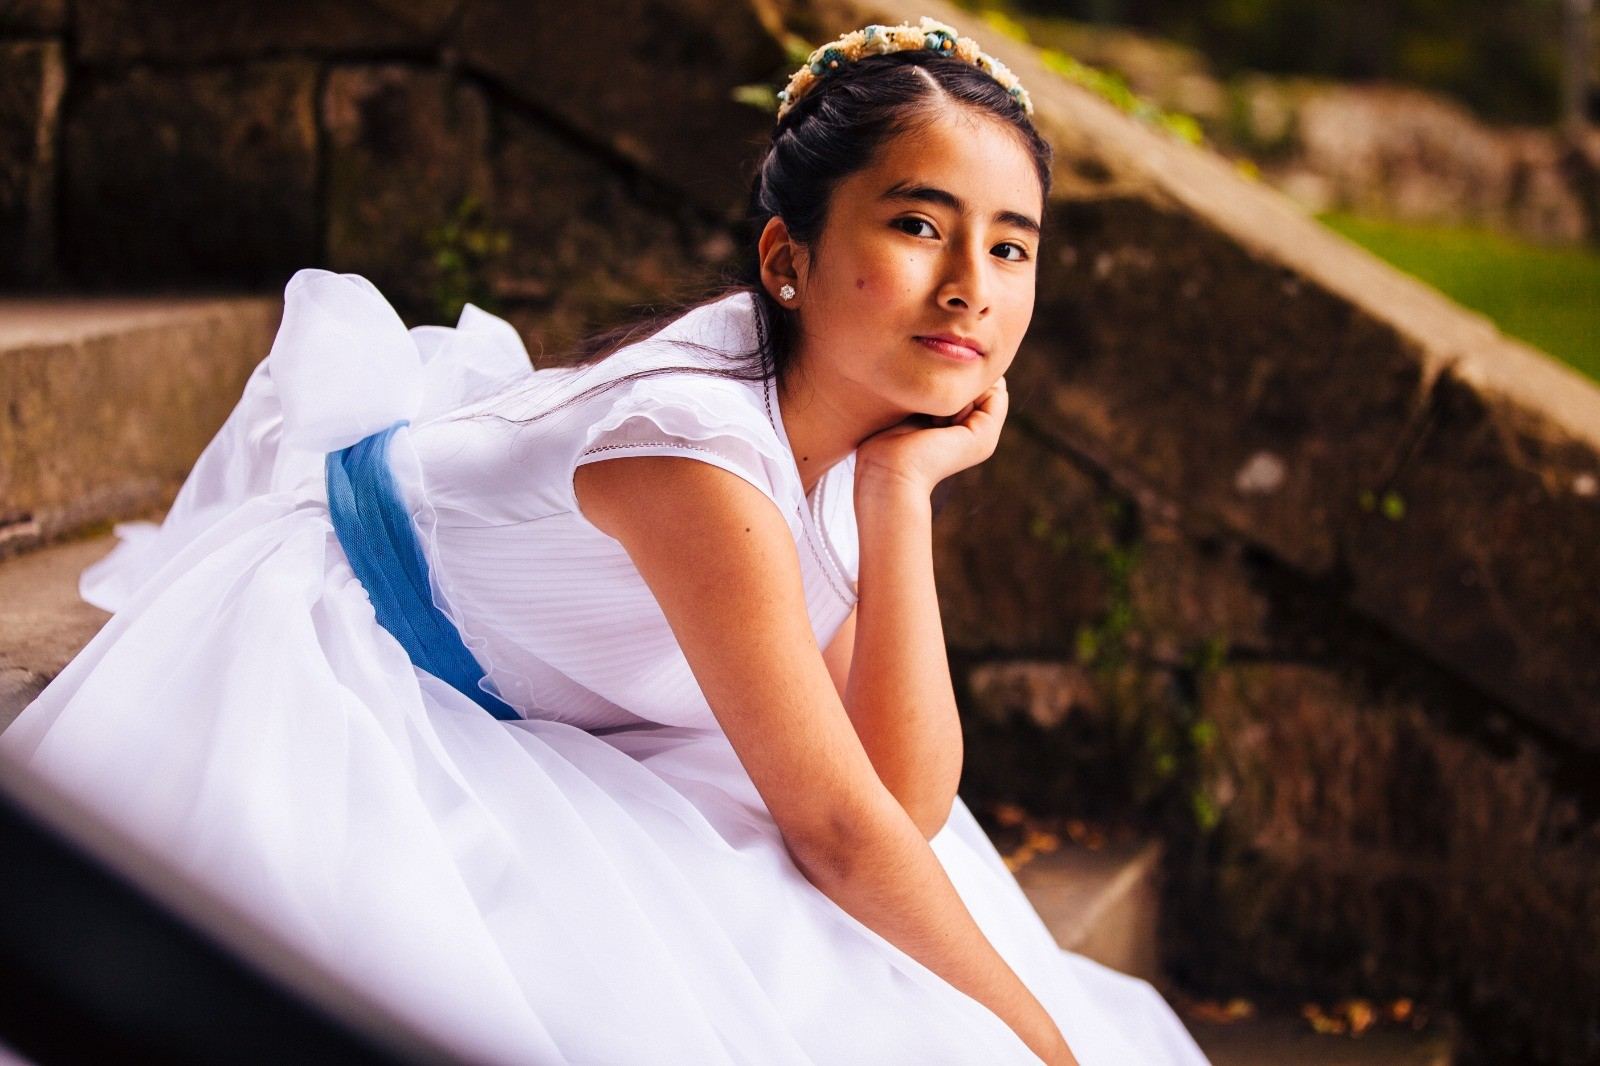 Reportaje de comunion niña. Fotografo Berango, Getxo, Sopelana, Bilbao. Fotografo Kunst Photo & Art